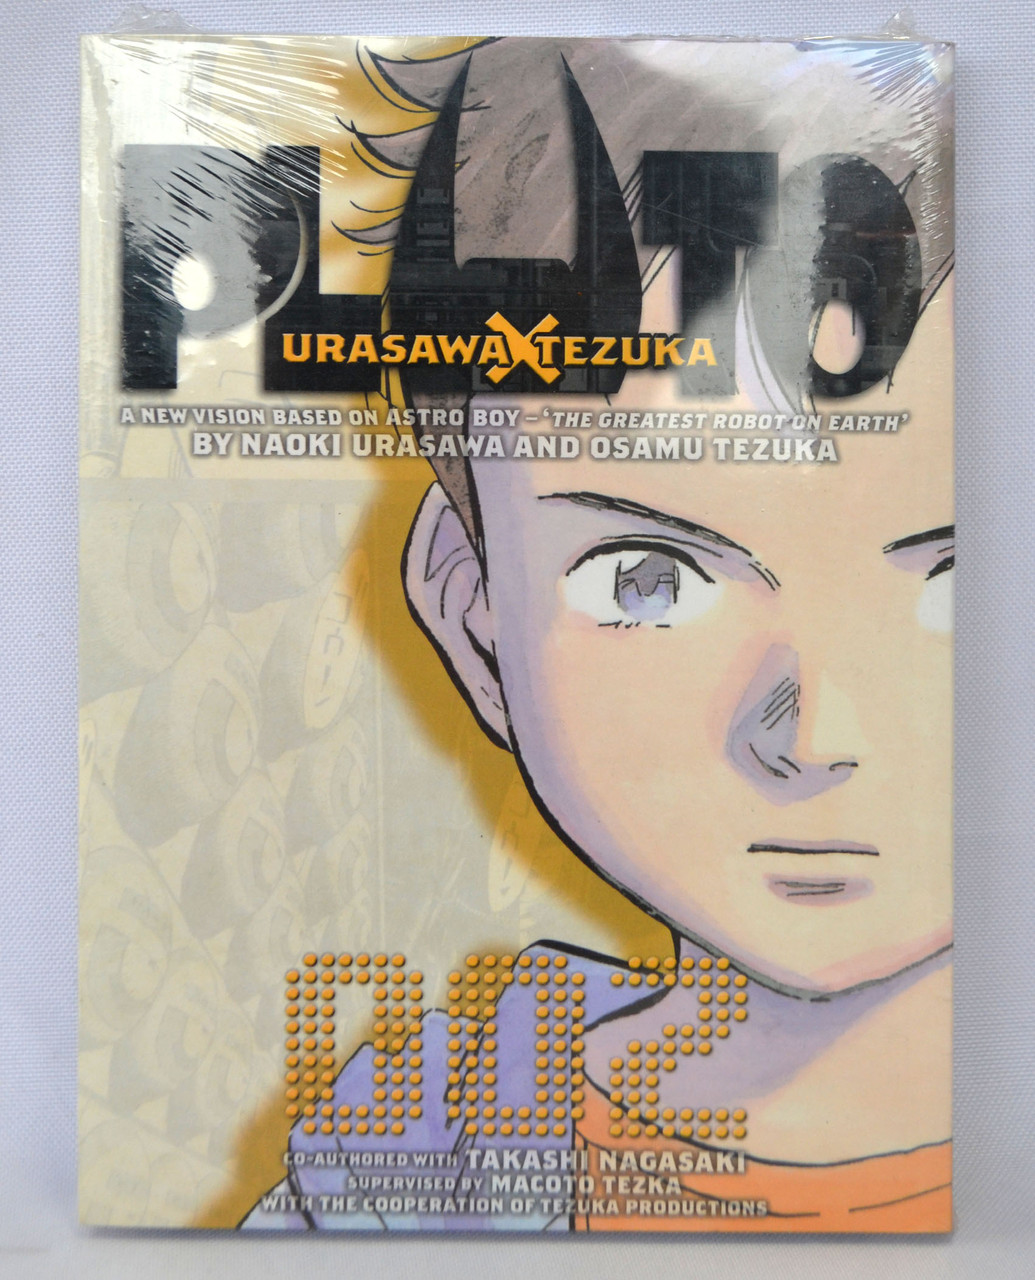 Manga Pluto: Urasawa x Tezuka, Vol. 2 (English language)